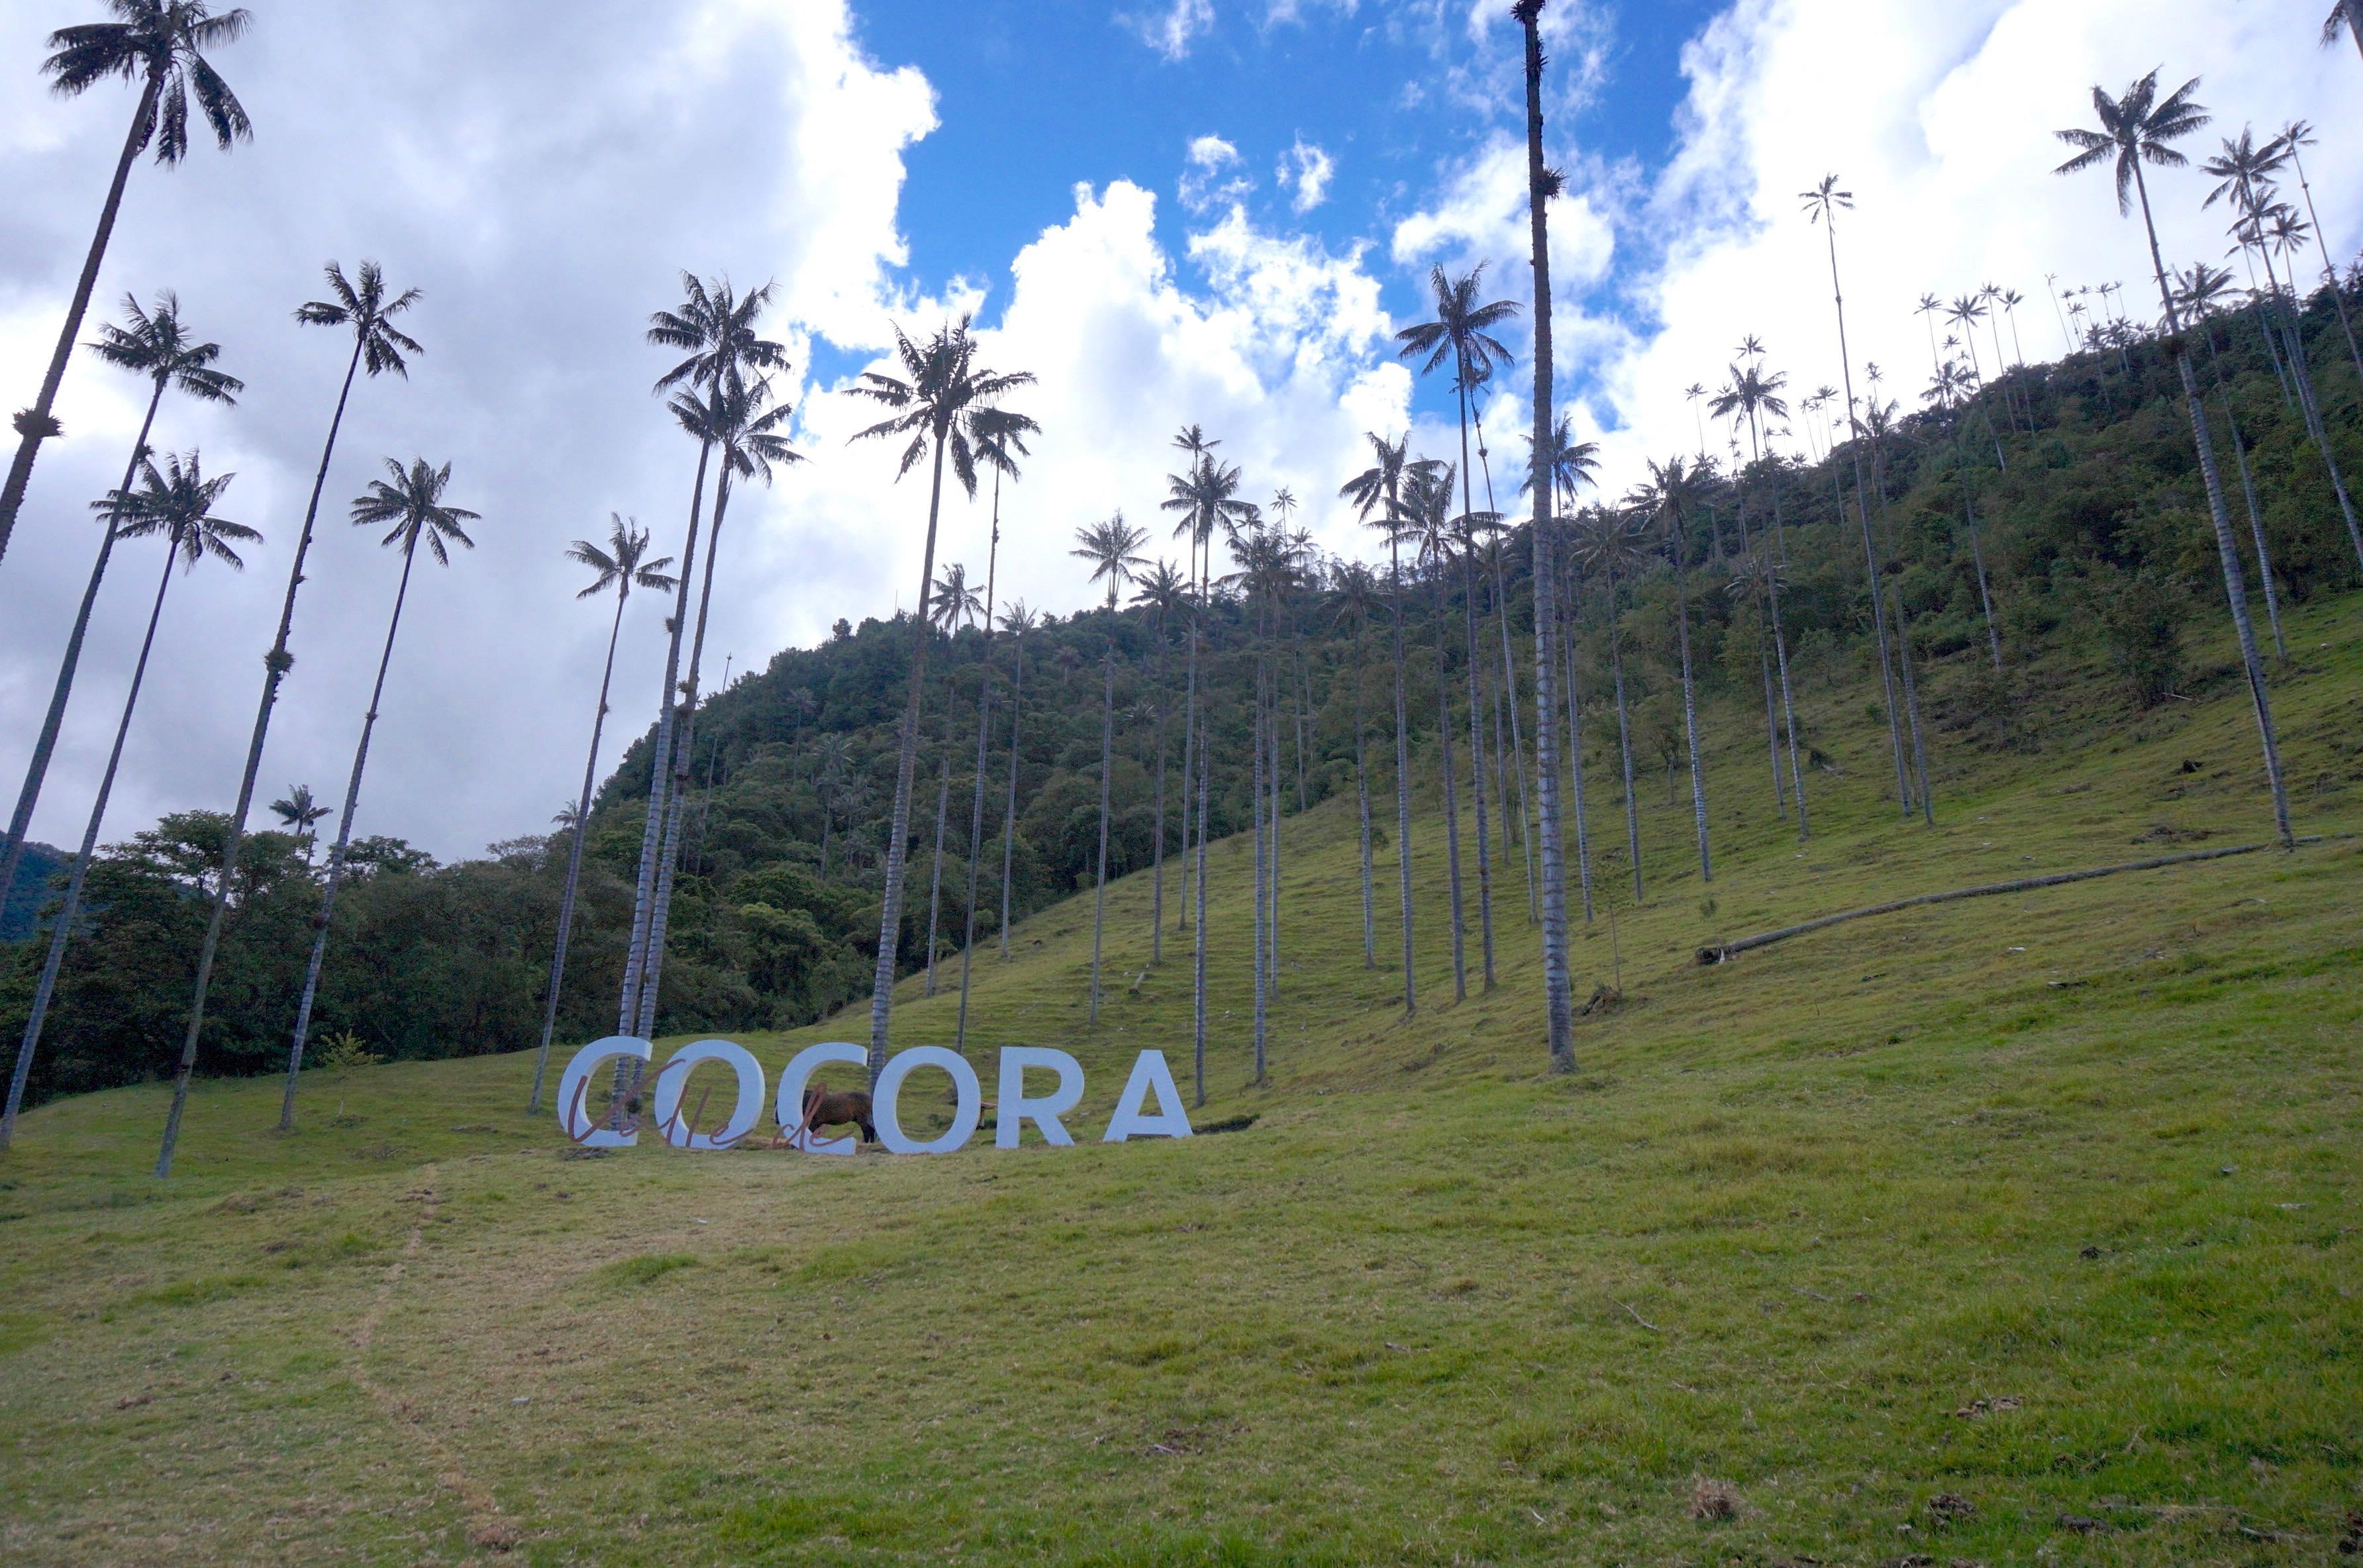 vallée de cocora, colombie